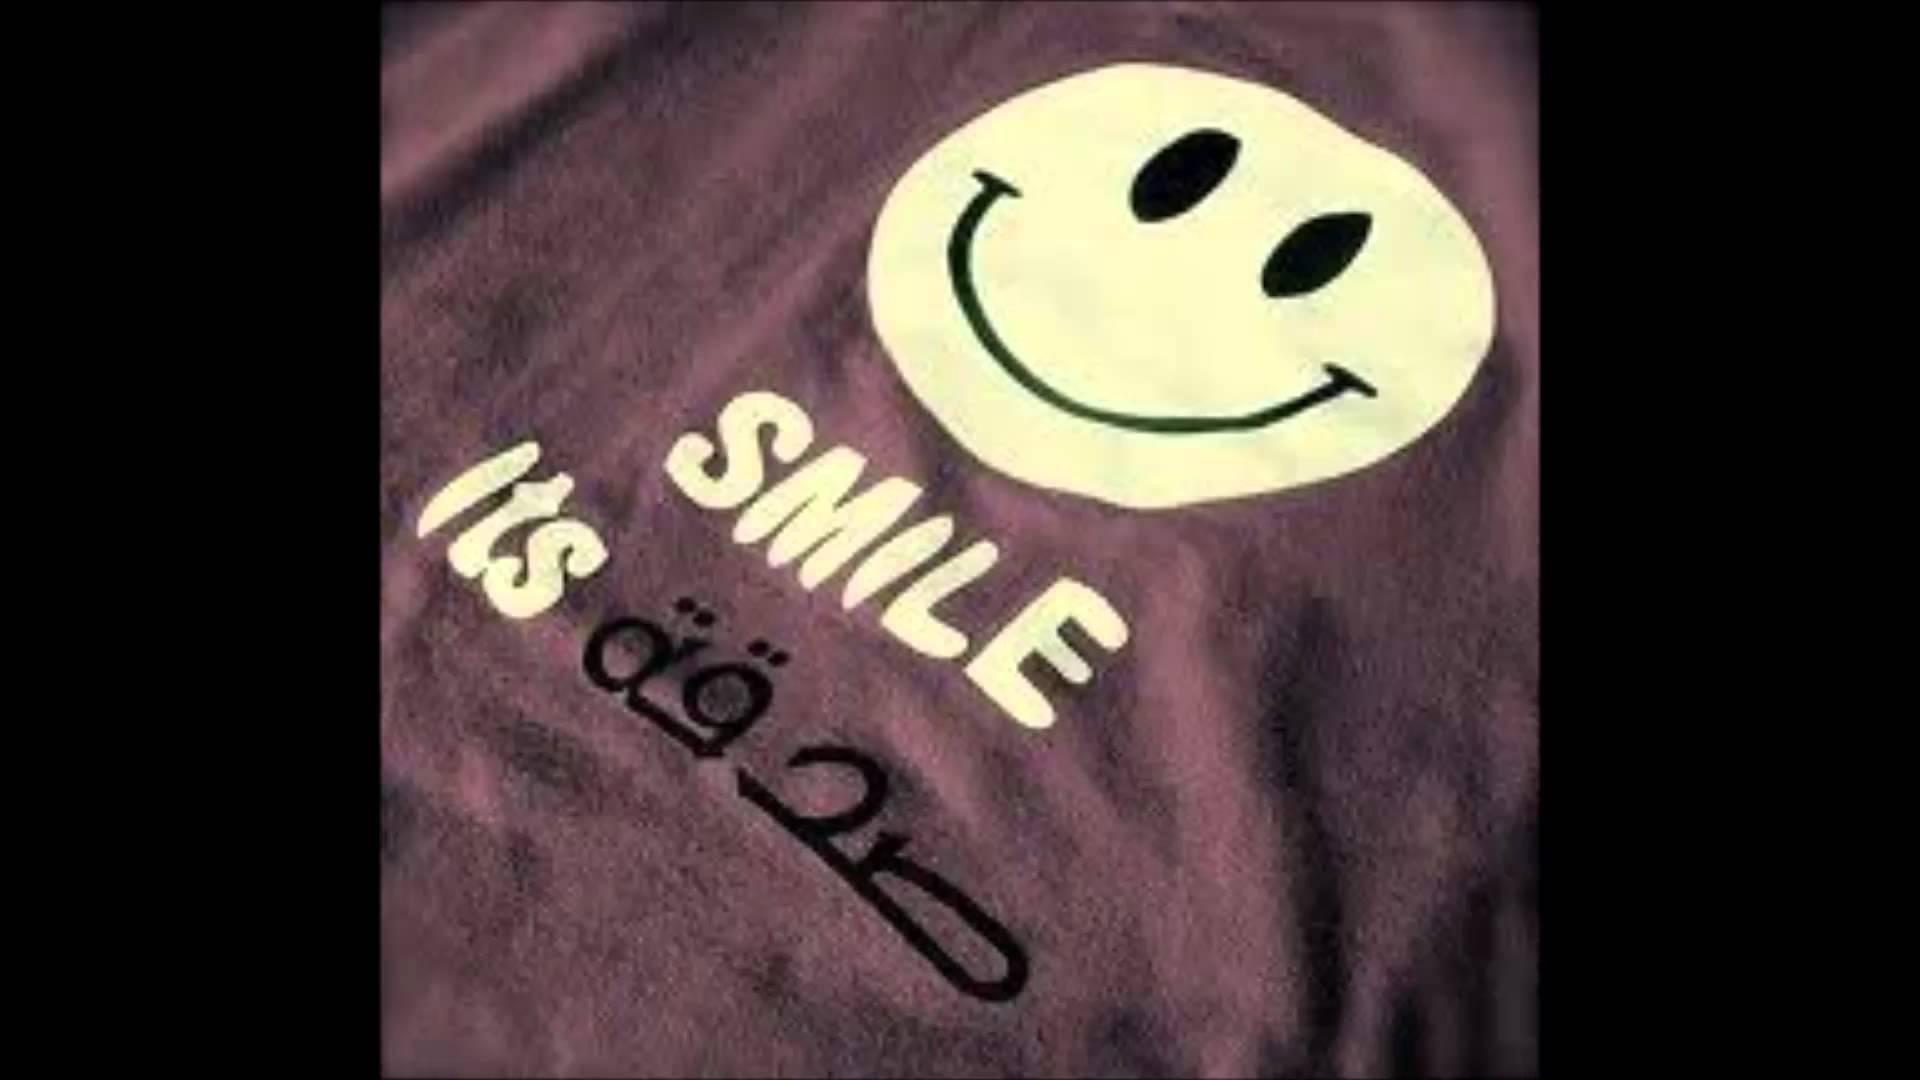 بالصور صور عن الابتسامه , اروع صور لابتسامه جميله 3153 6